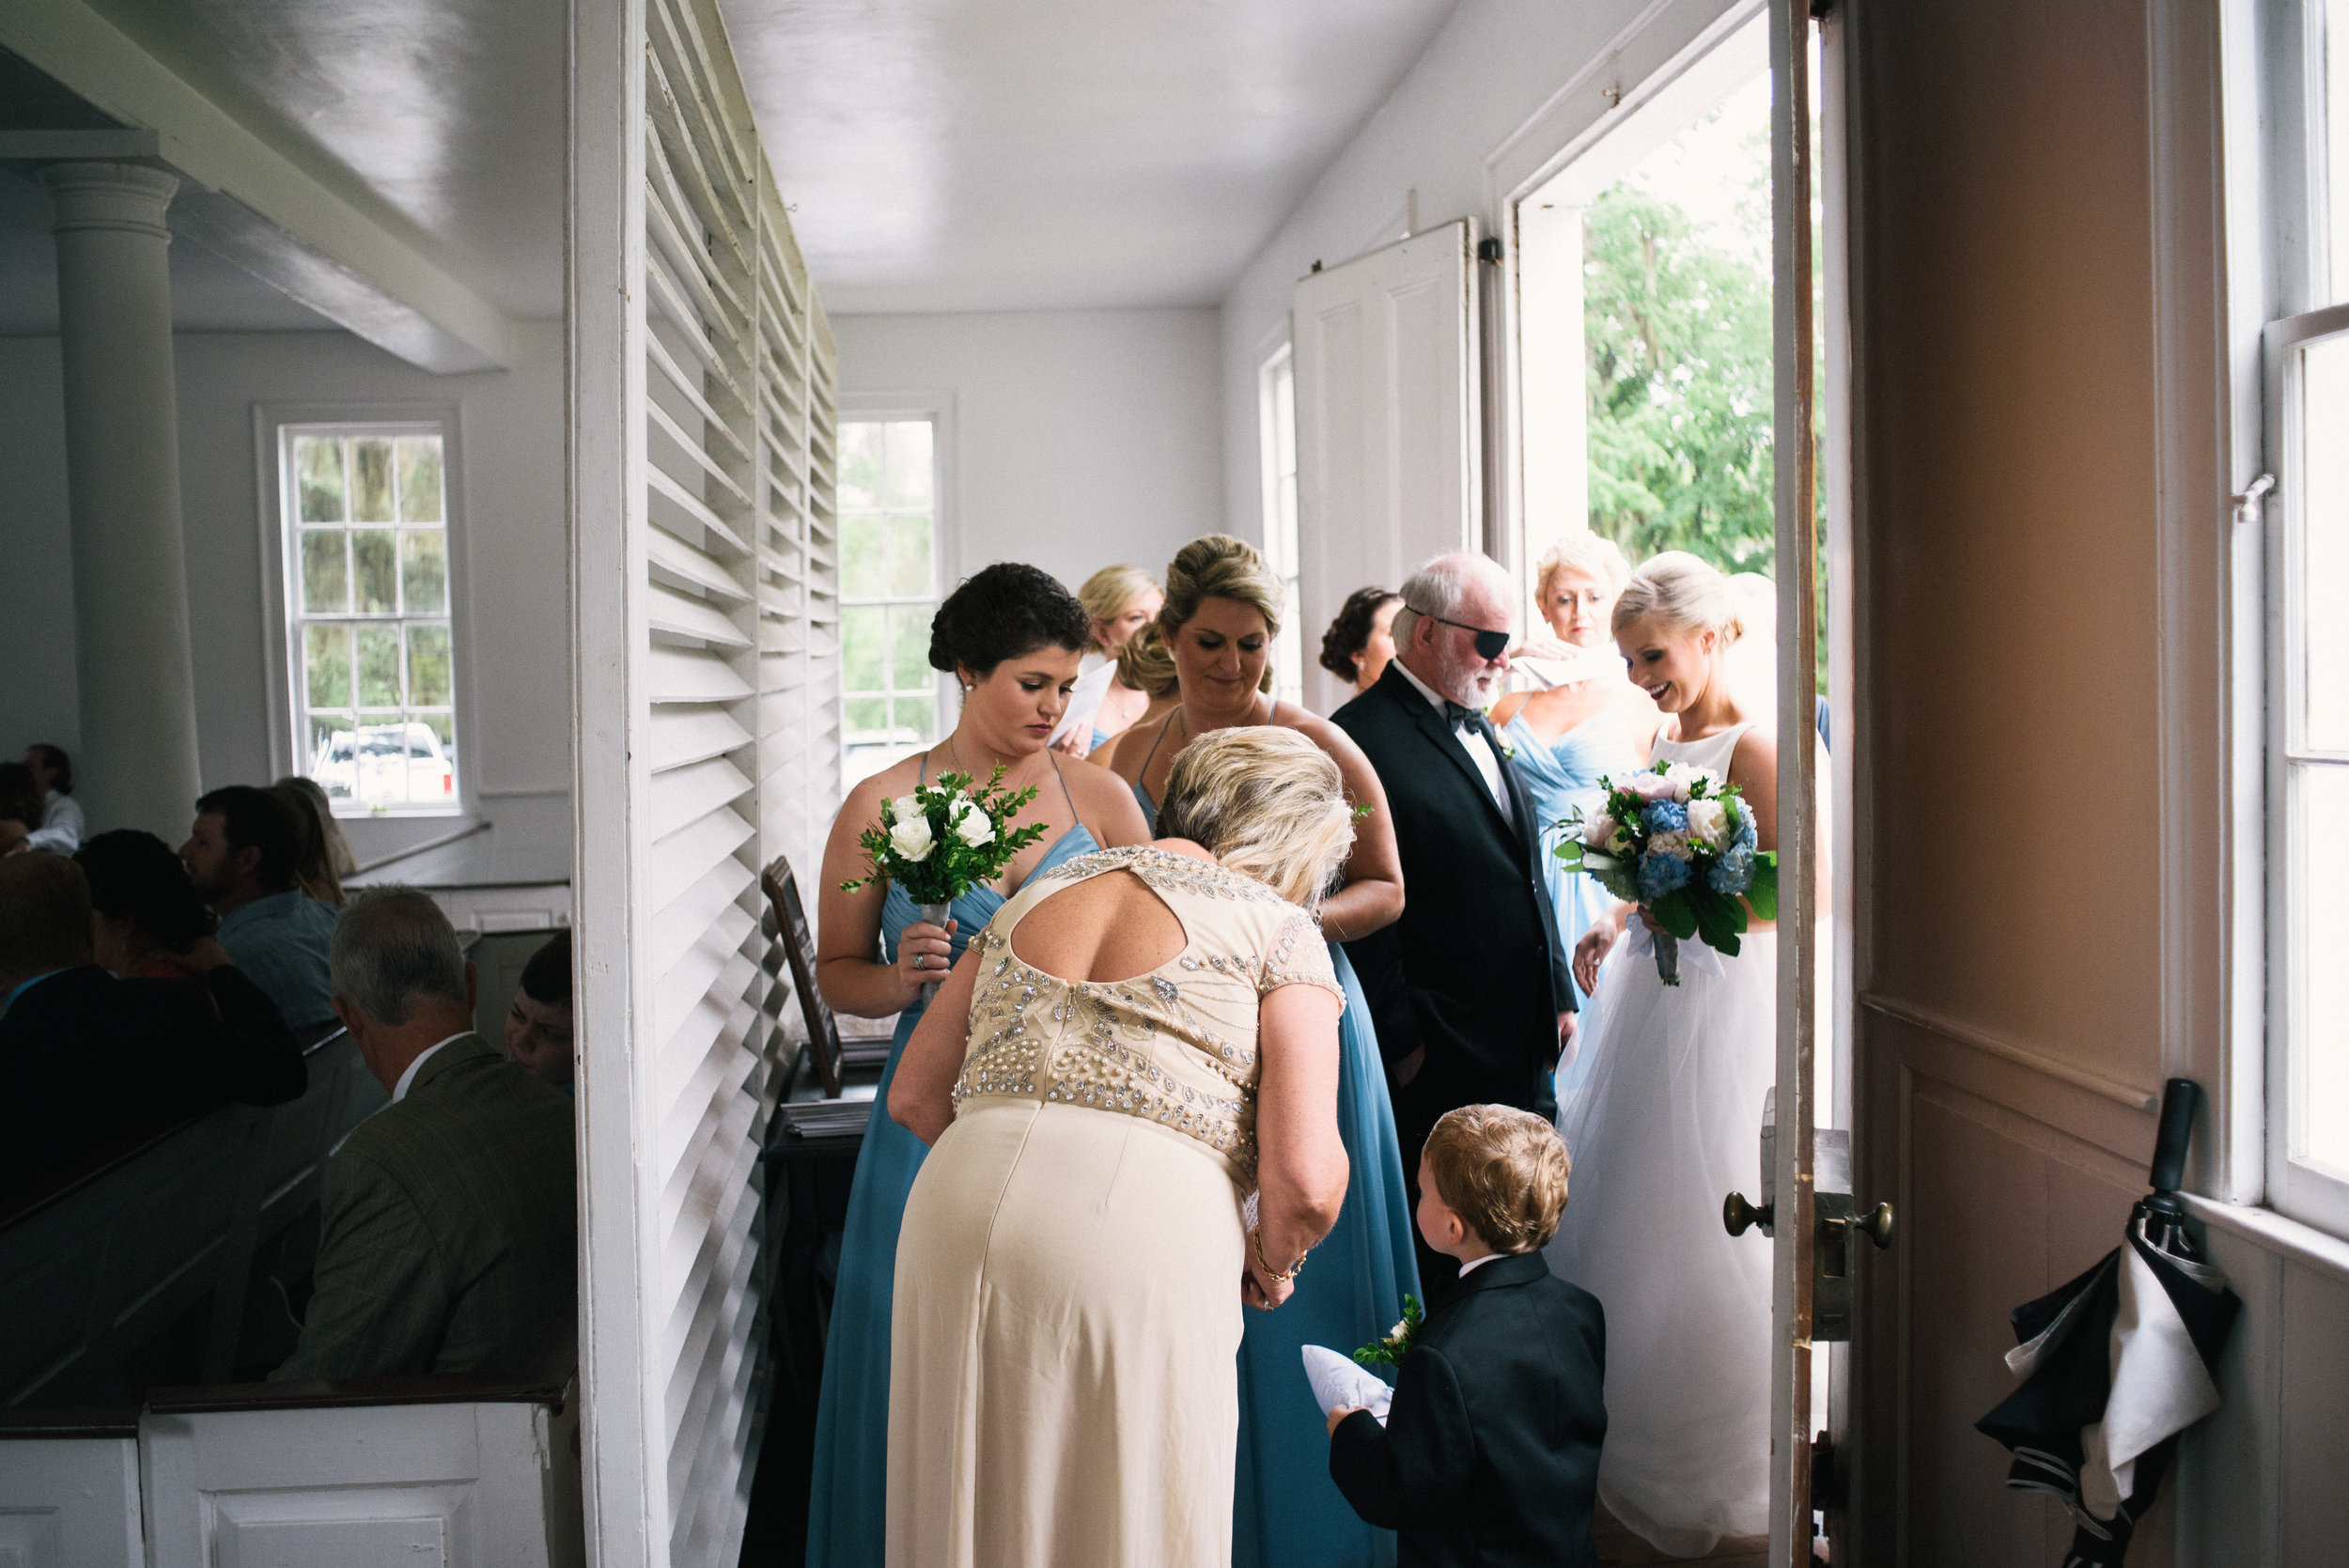 ali-and-jared-savannah-georgia-may-2017-wedding-meg-hill-photo-(241of760).jpg